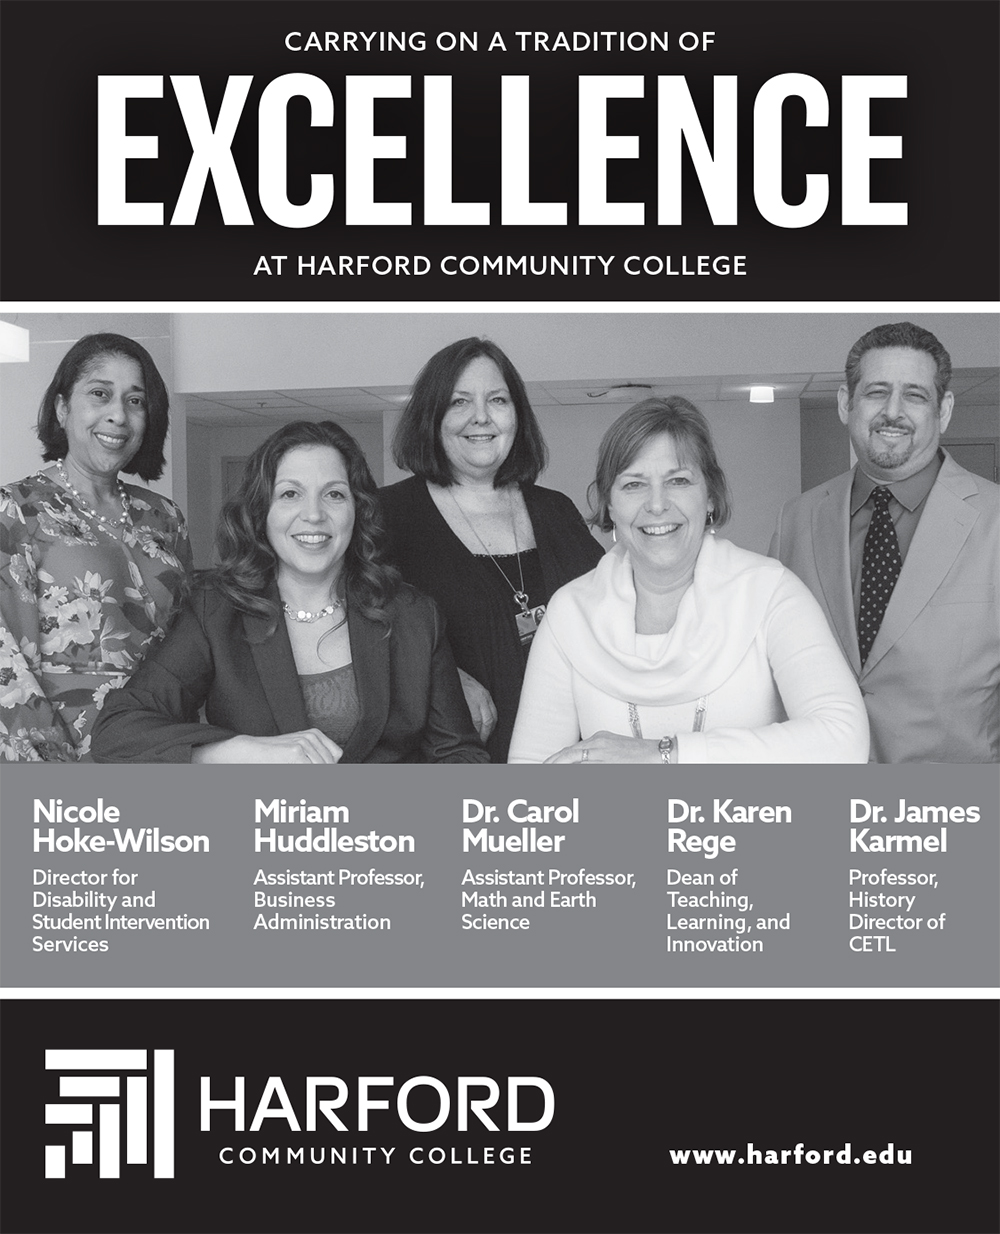 2019 Harford Ad image